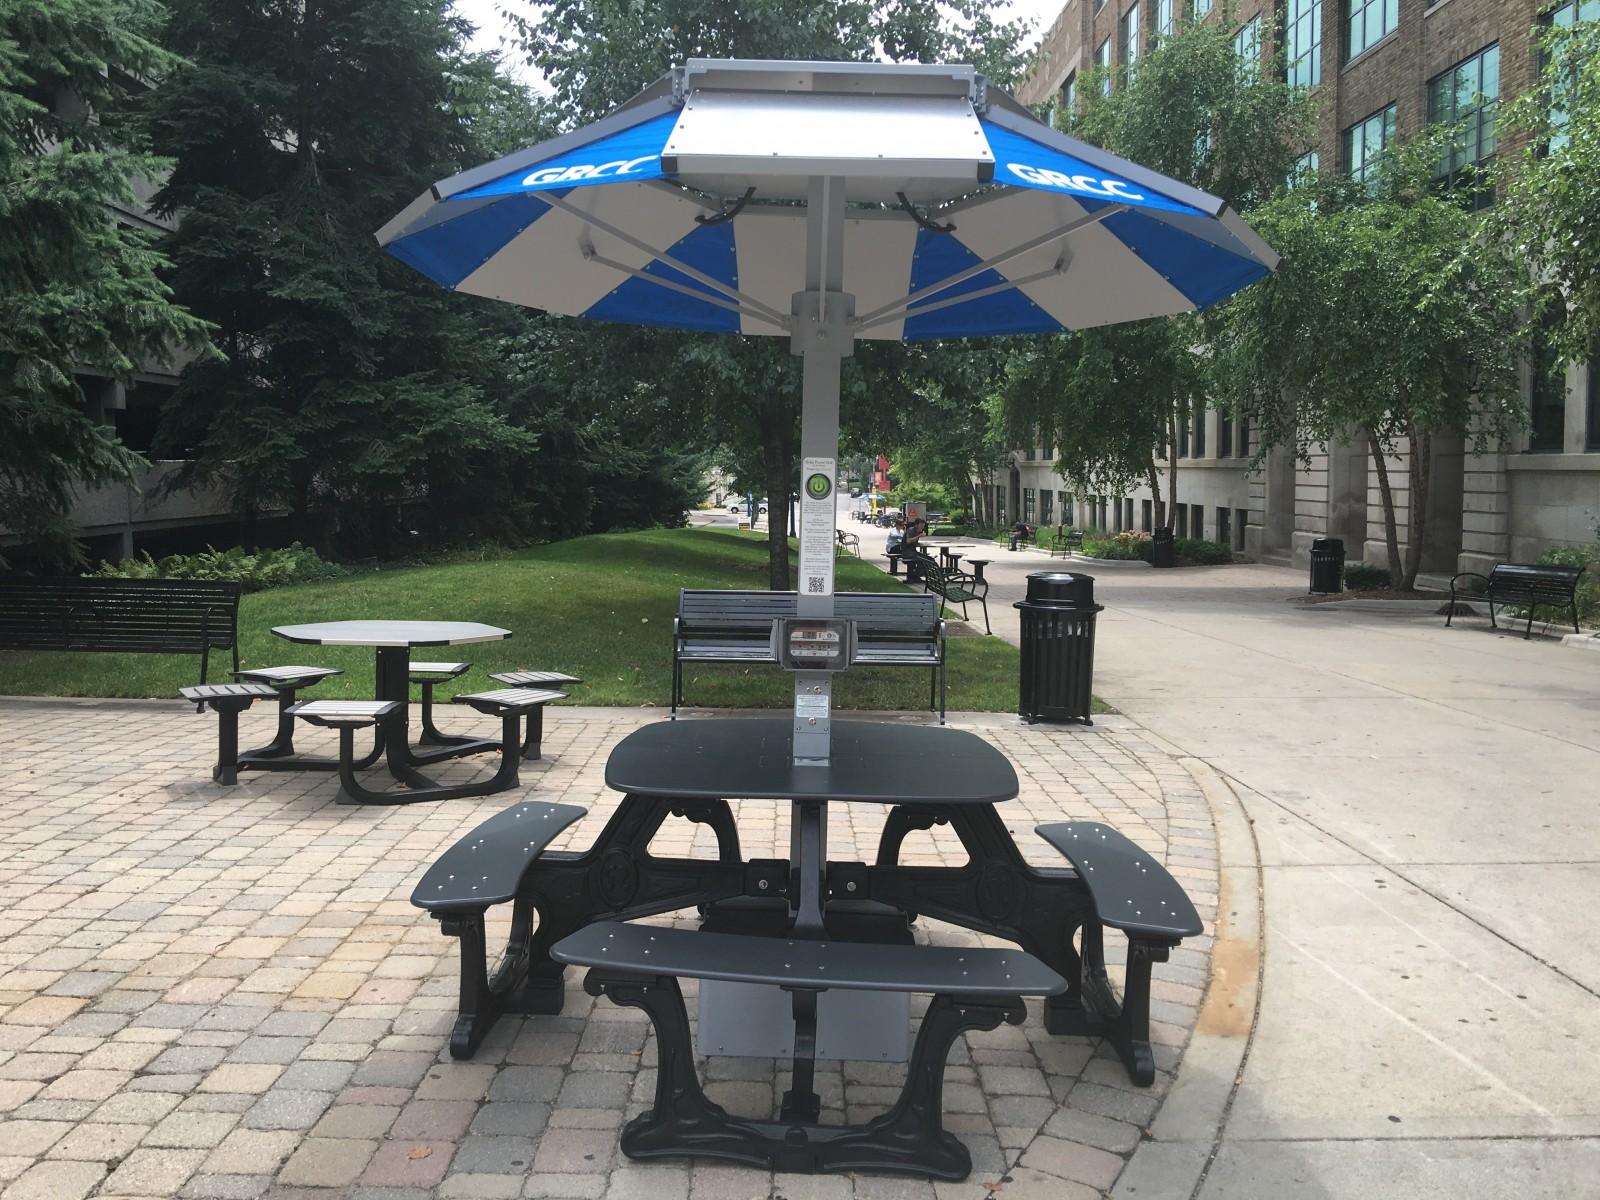 GRCC Installs Solar Powered Tables The Collegiate Live - Solar picnic table